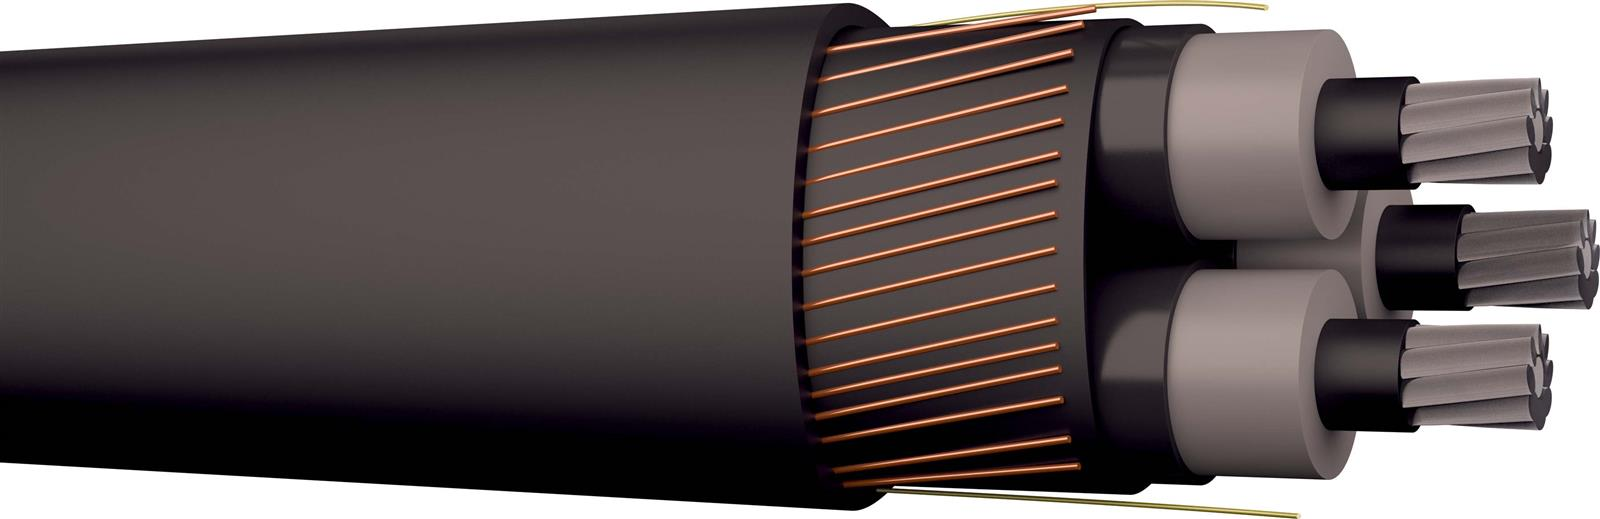 AXLJ-RMF 3X50/16 24KV T1000/K26